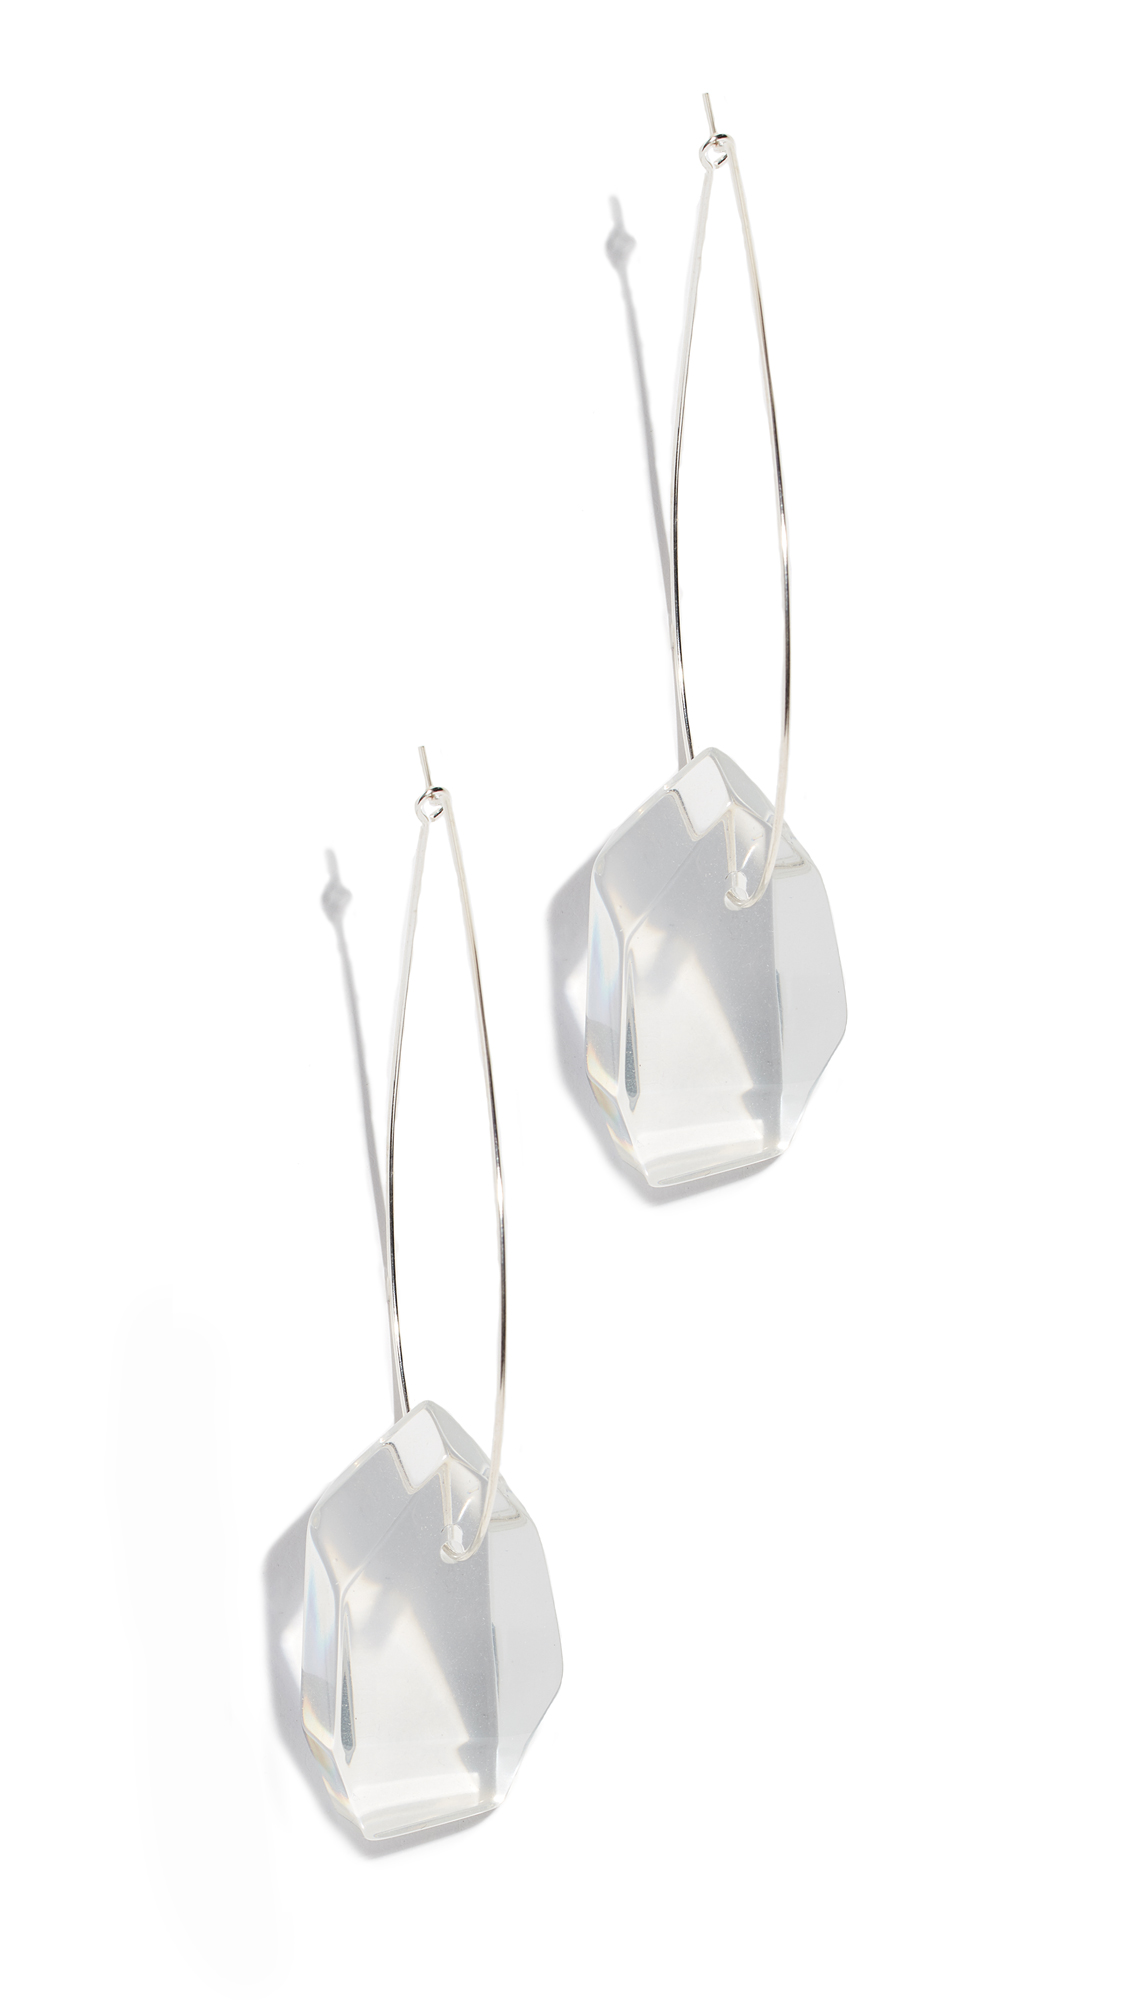 DINOSAUR DESIGNS Medium Crystallized Earrings in Clear